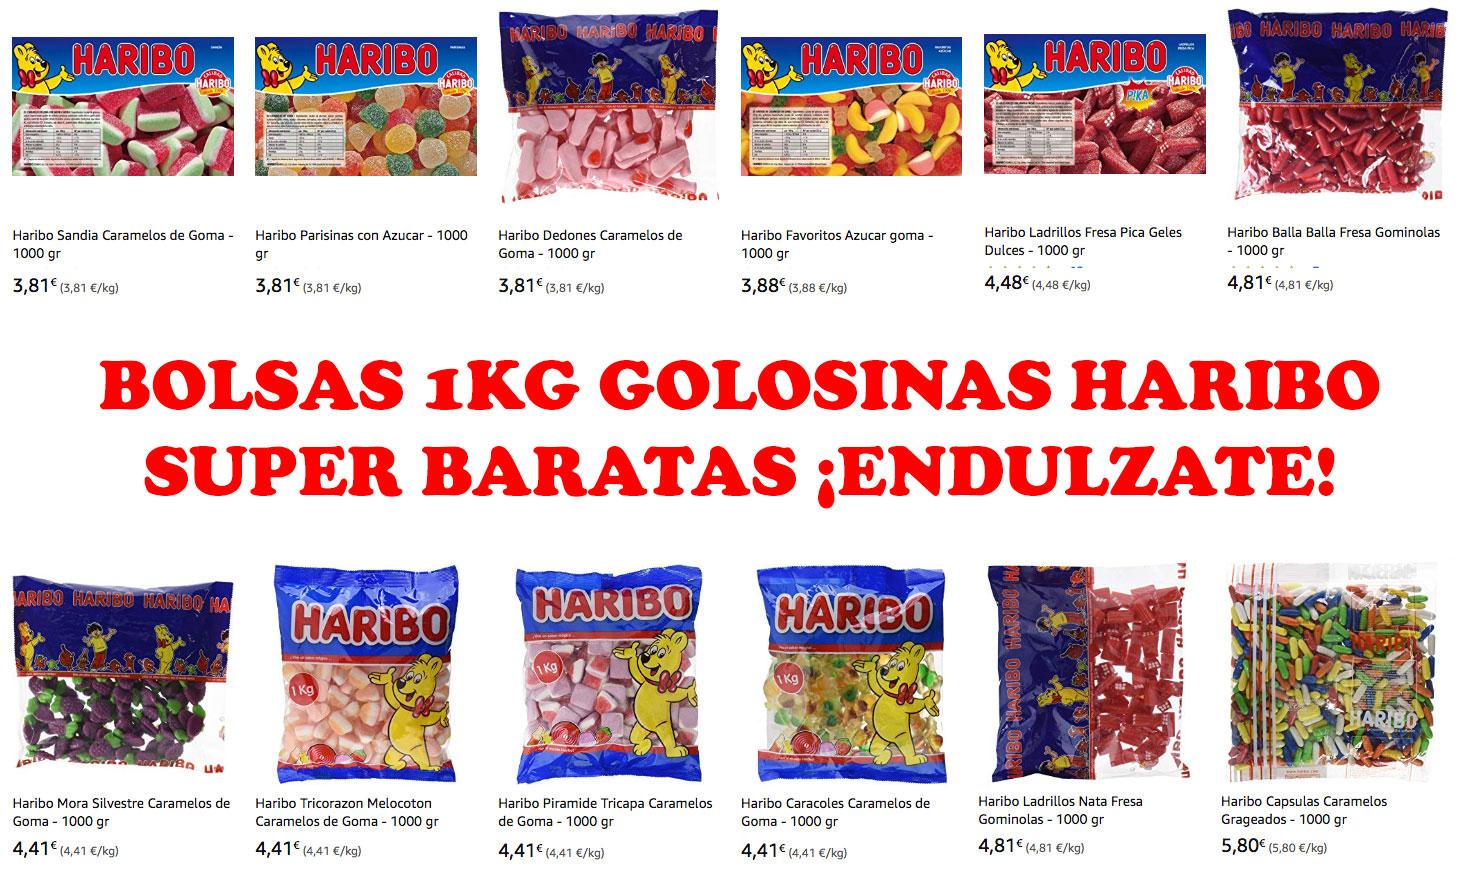 GOLOSINAS-HARIBO-BARATAS